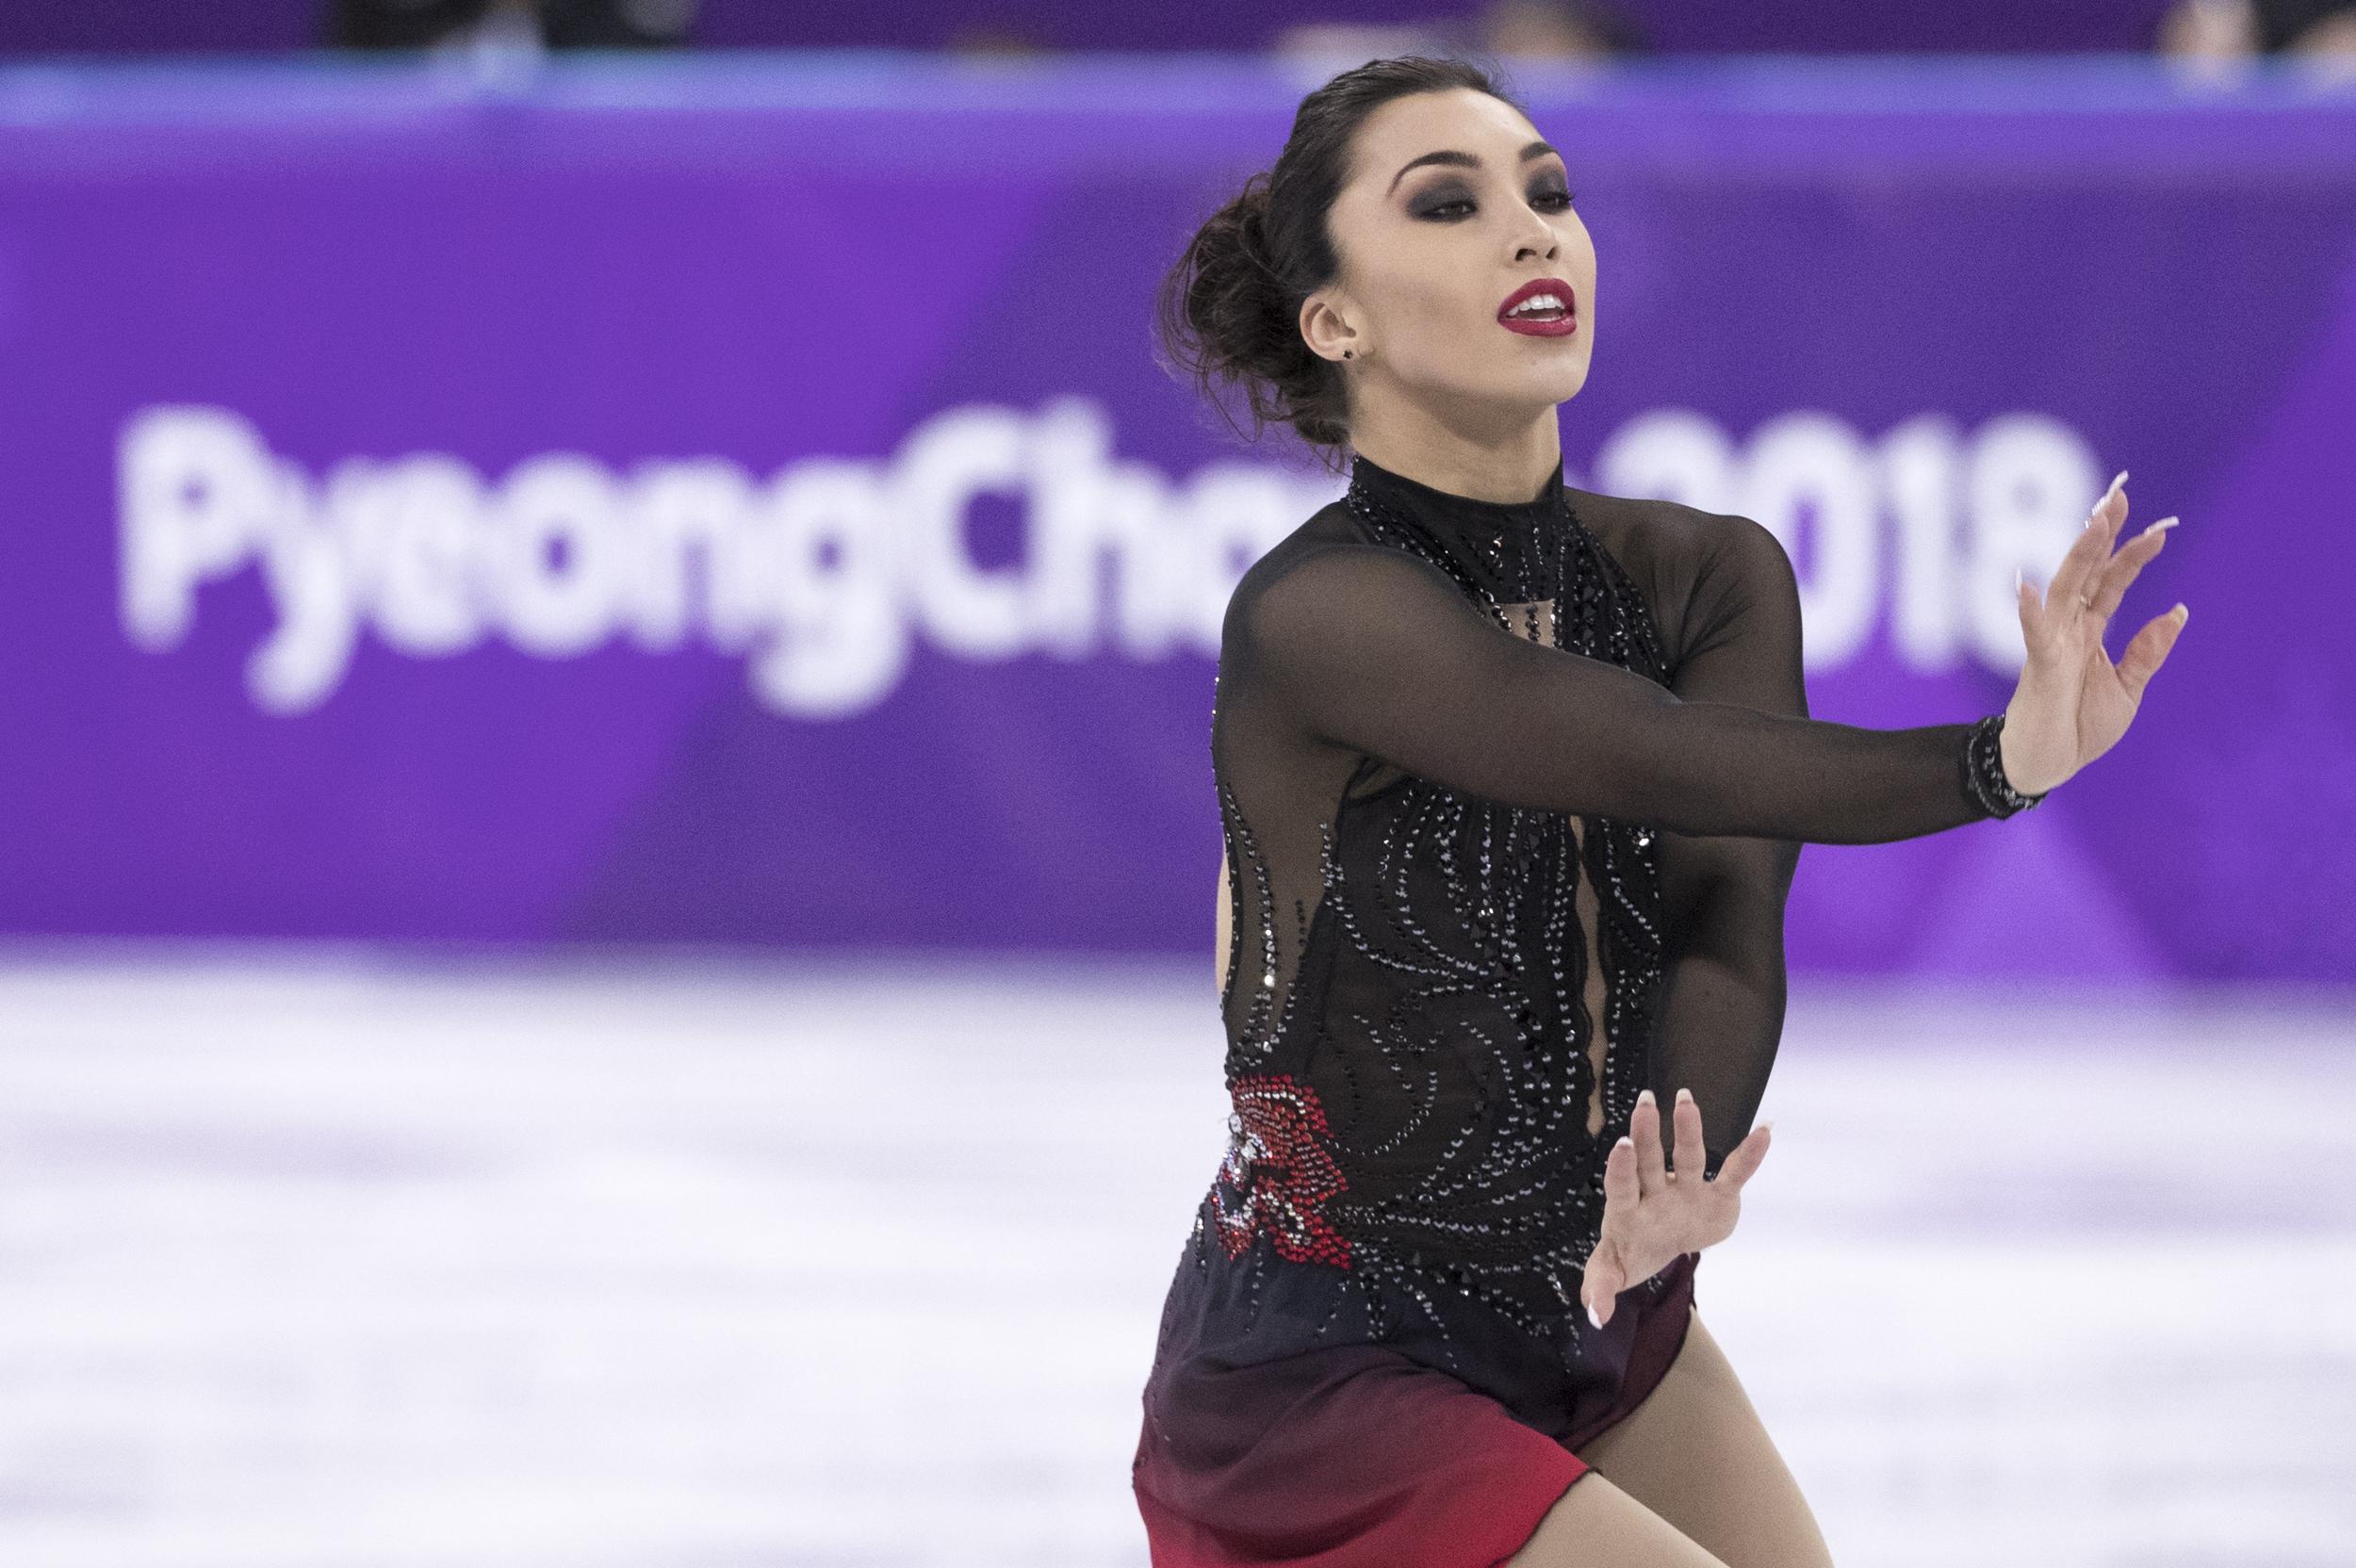 Team Canada Gabrielle Daleman PyeongChang 2018 short program